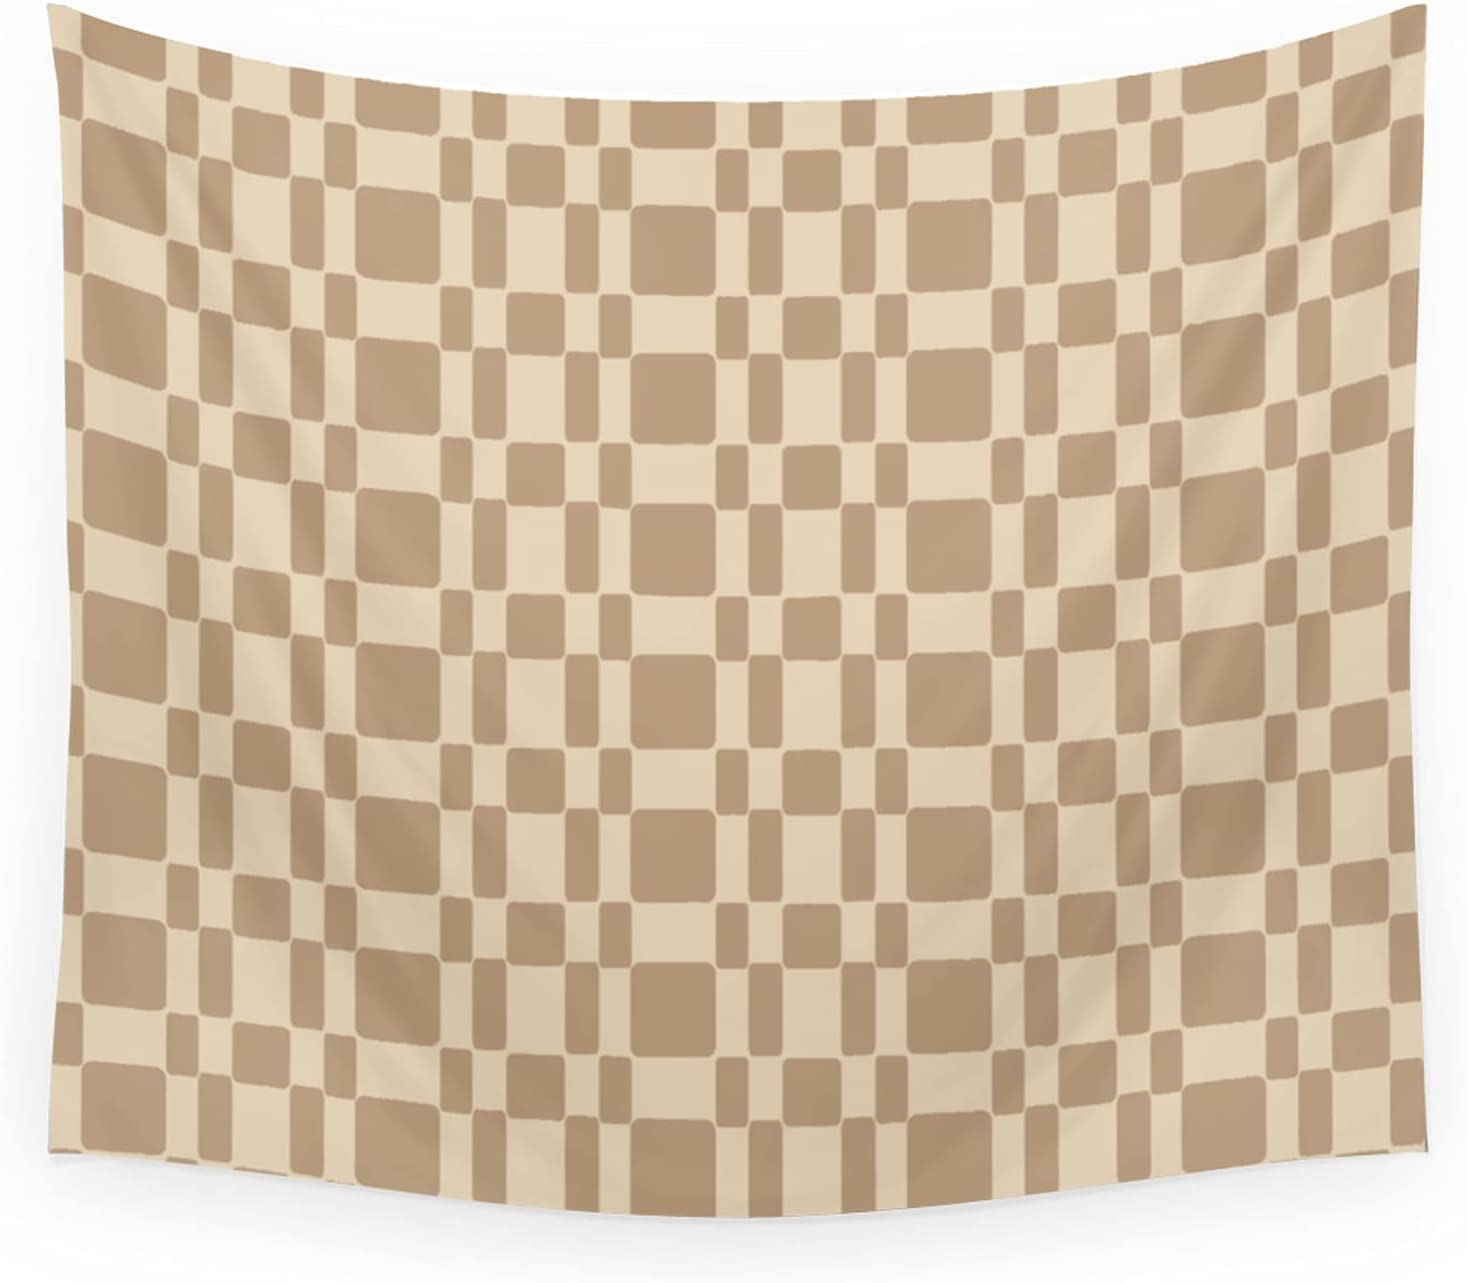 Society6 Retro cheap 1950's Stitch Fabric Pattern Cordingly by Tan Kay Latest item